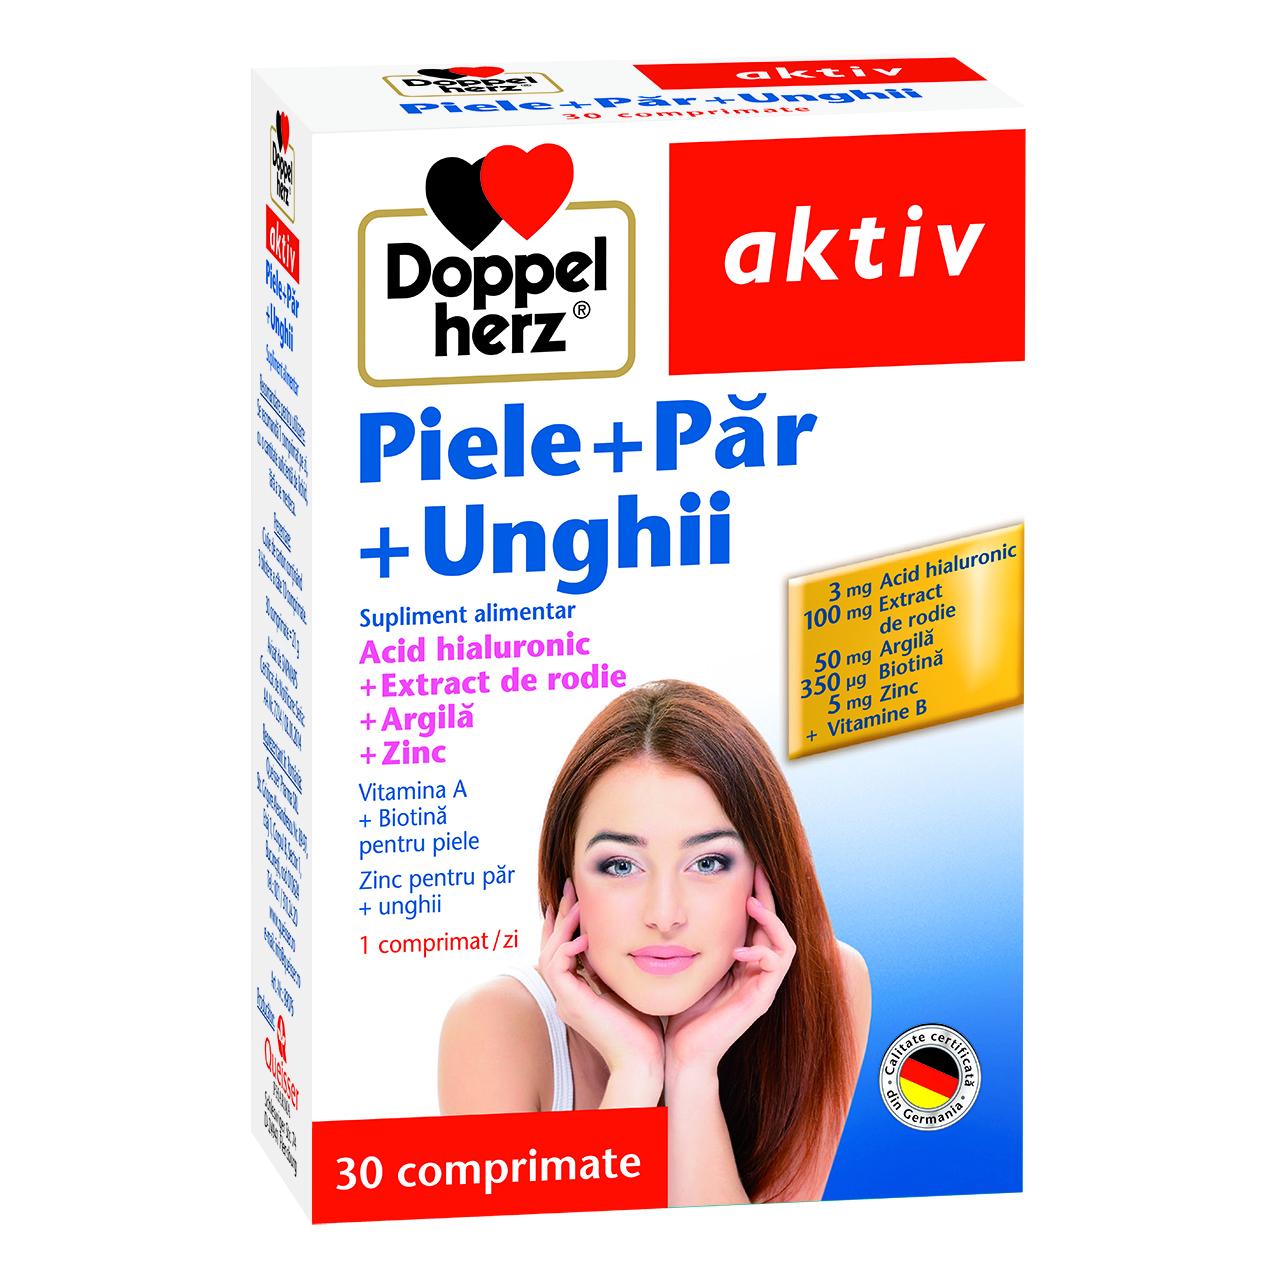 Piele + Par + Unghii, 30 comprimate, Doppelherz drmax.ro